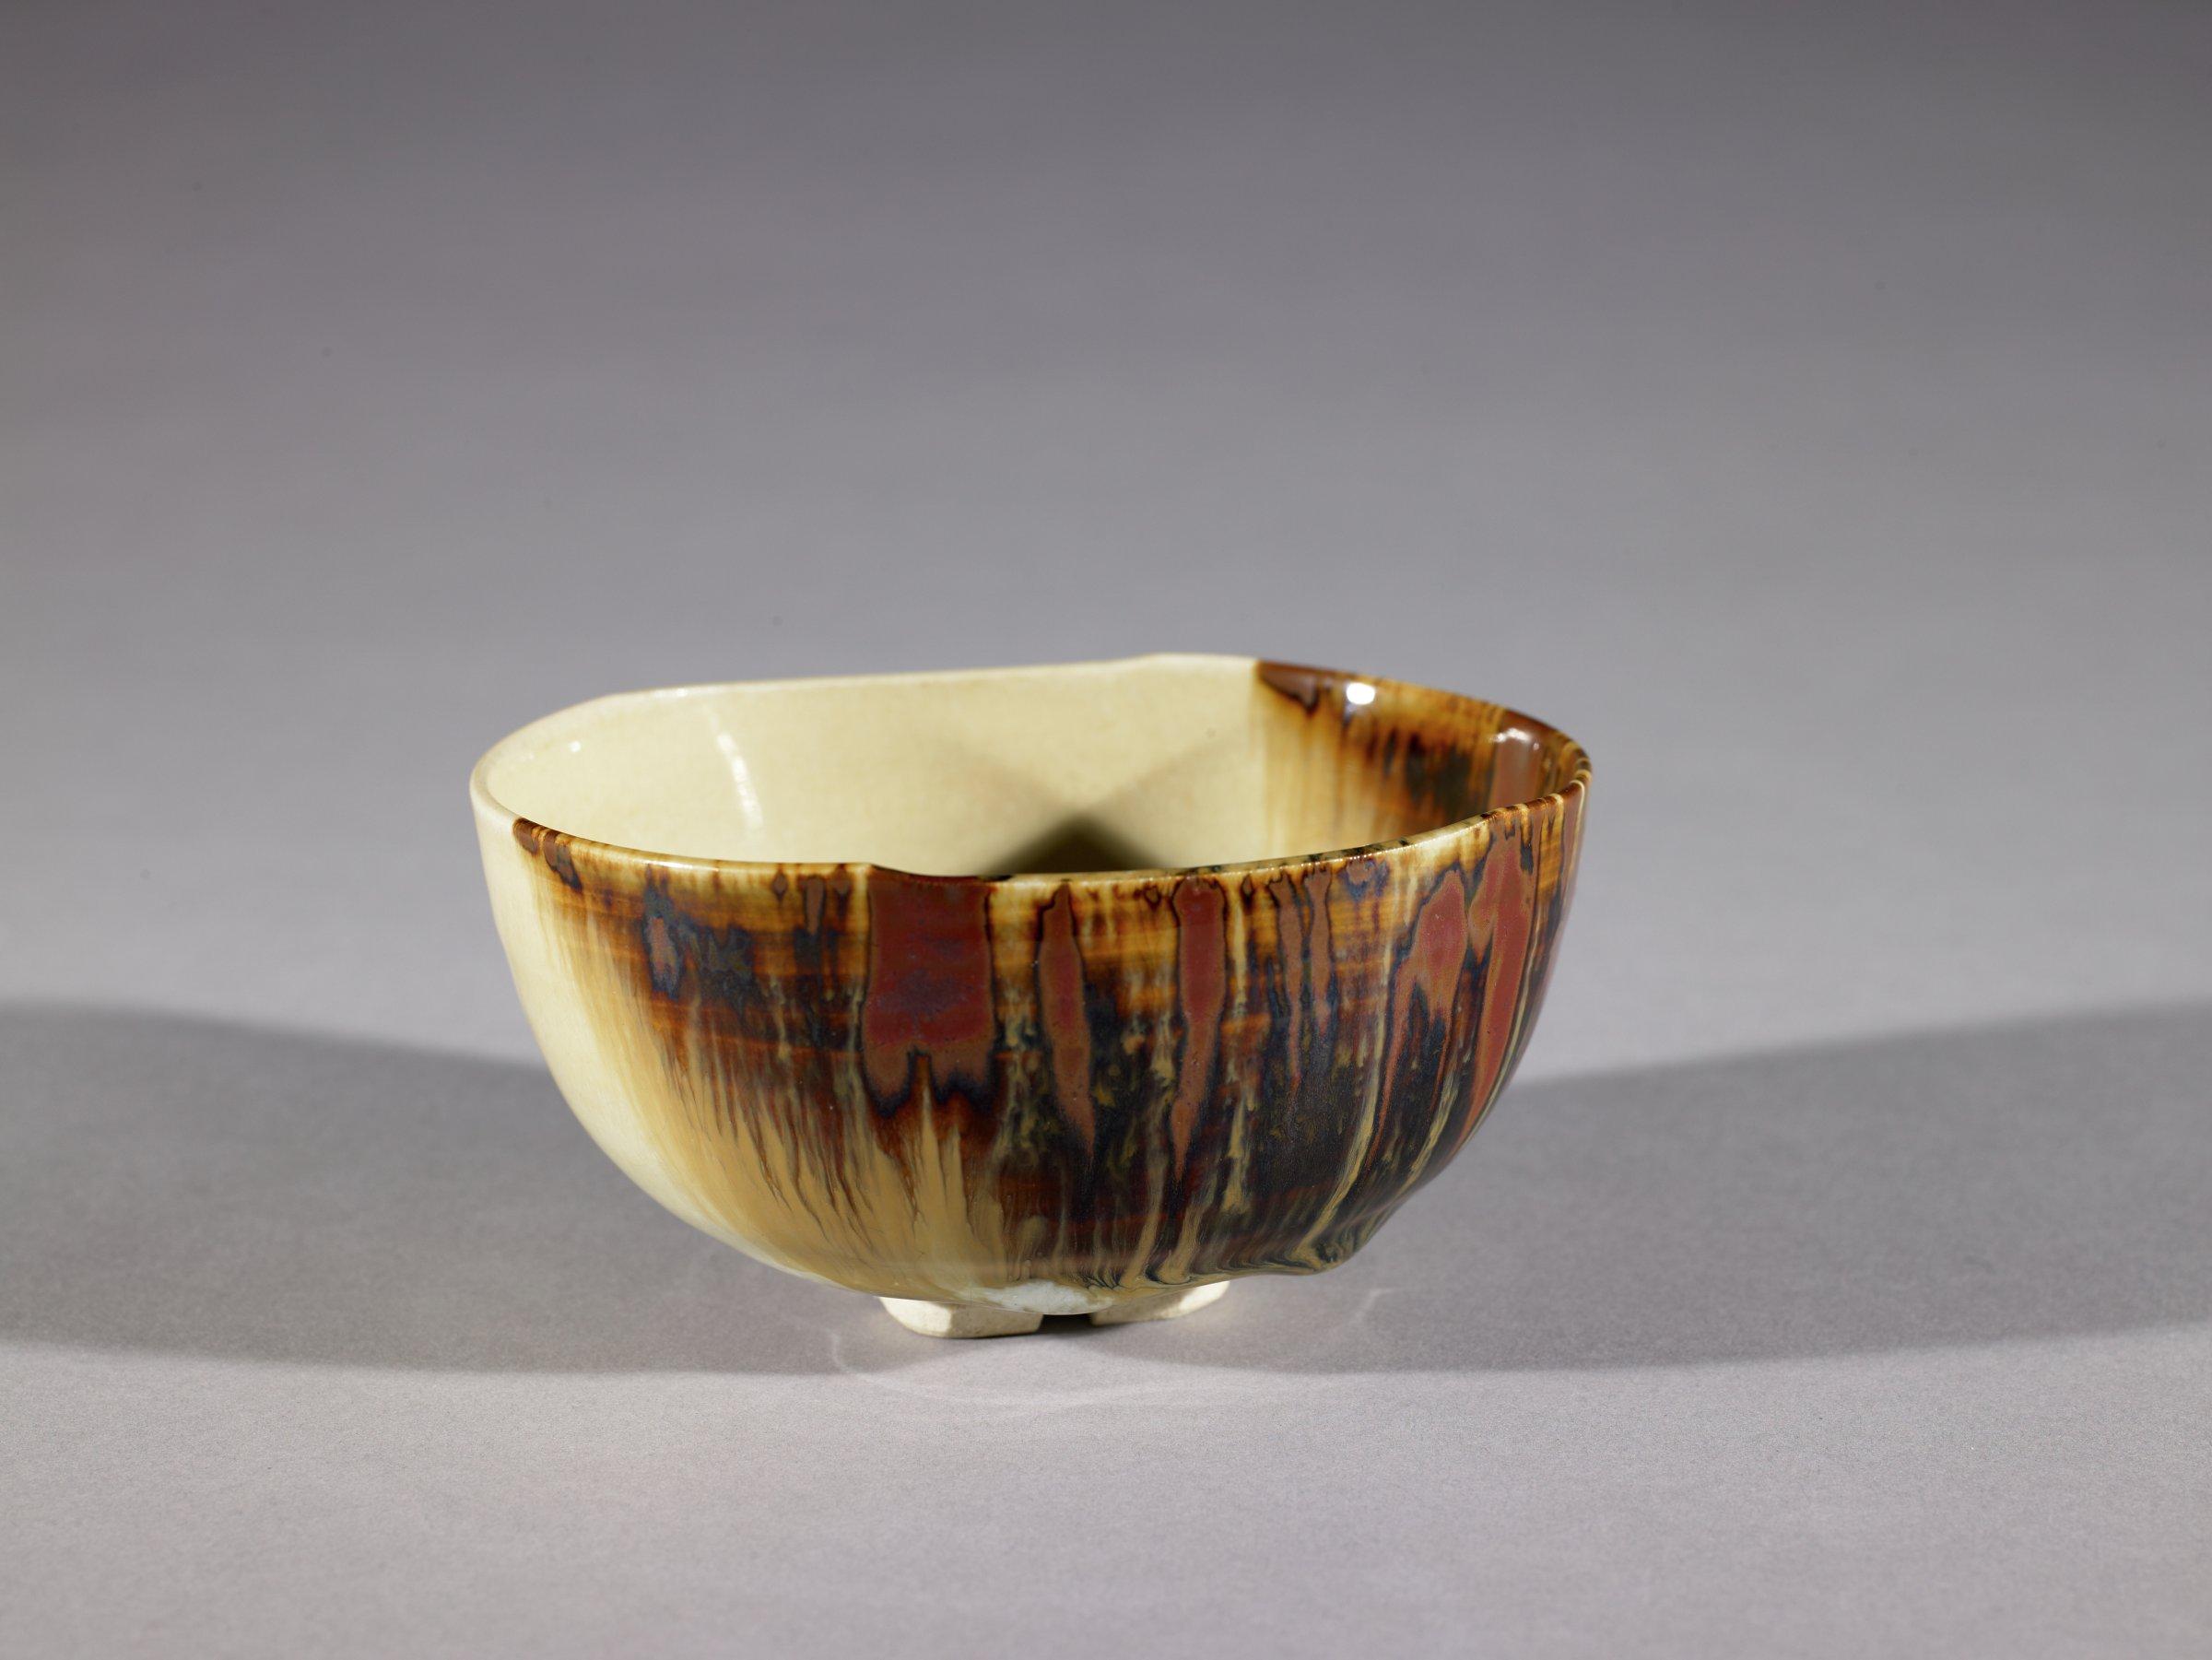 Tea Bowl, Zengoro Wazan, glazed stoneware, Kyoto ware